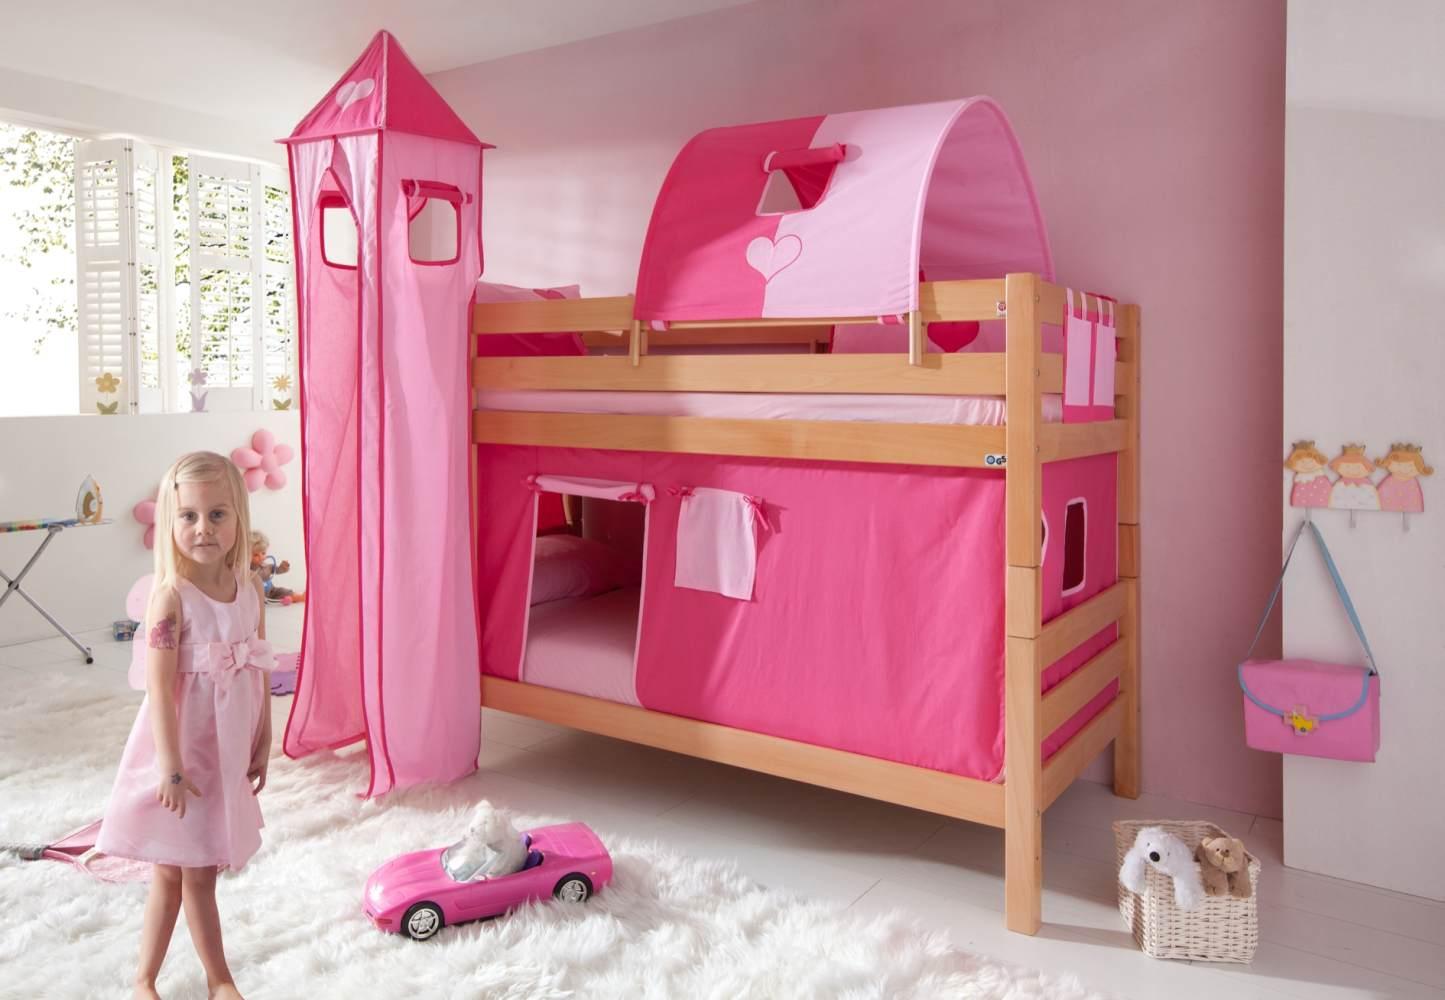 Etagenbett BENI Buche massiv natur lackiert mit Textilset pink/rosa/herz Bild 1